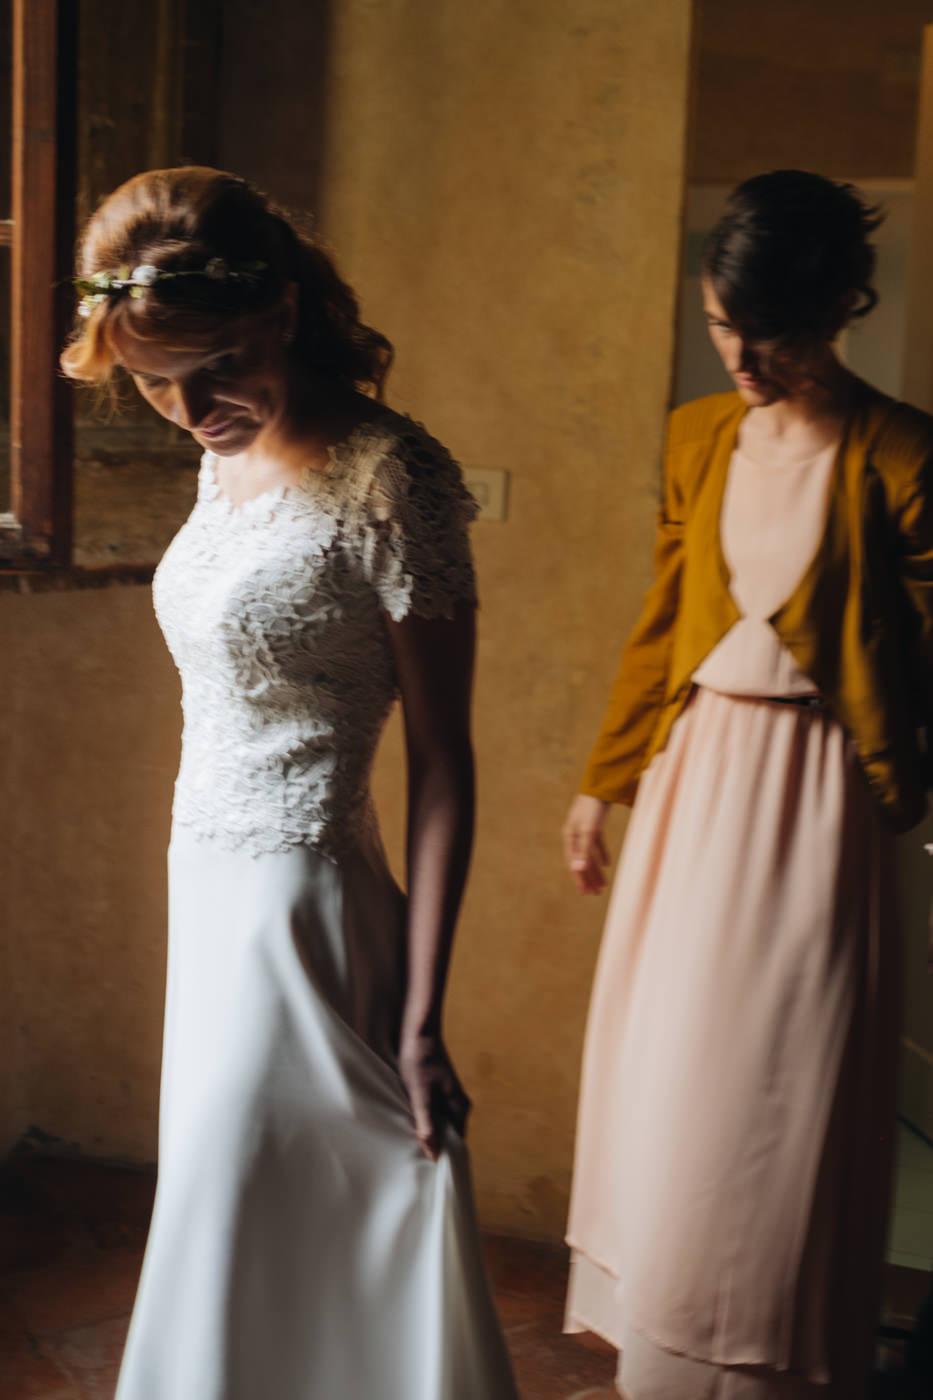 matrimoni_all_italiana_fotografo_matrimonio_toscana-19.jpg